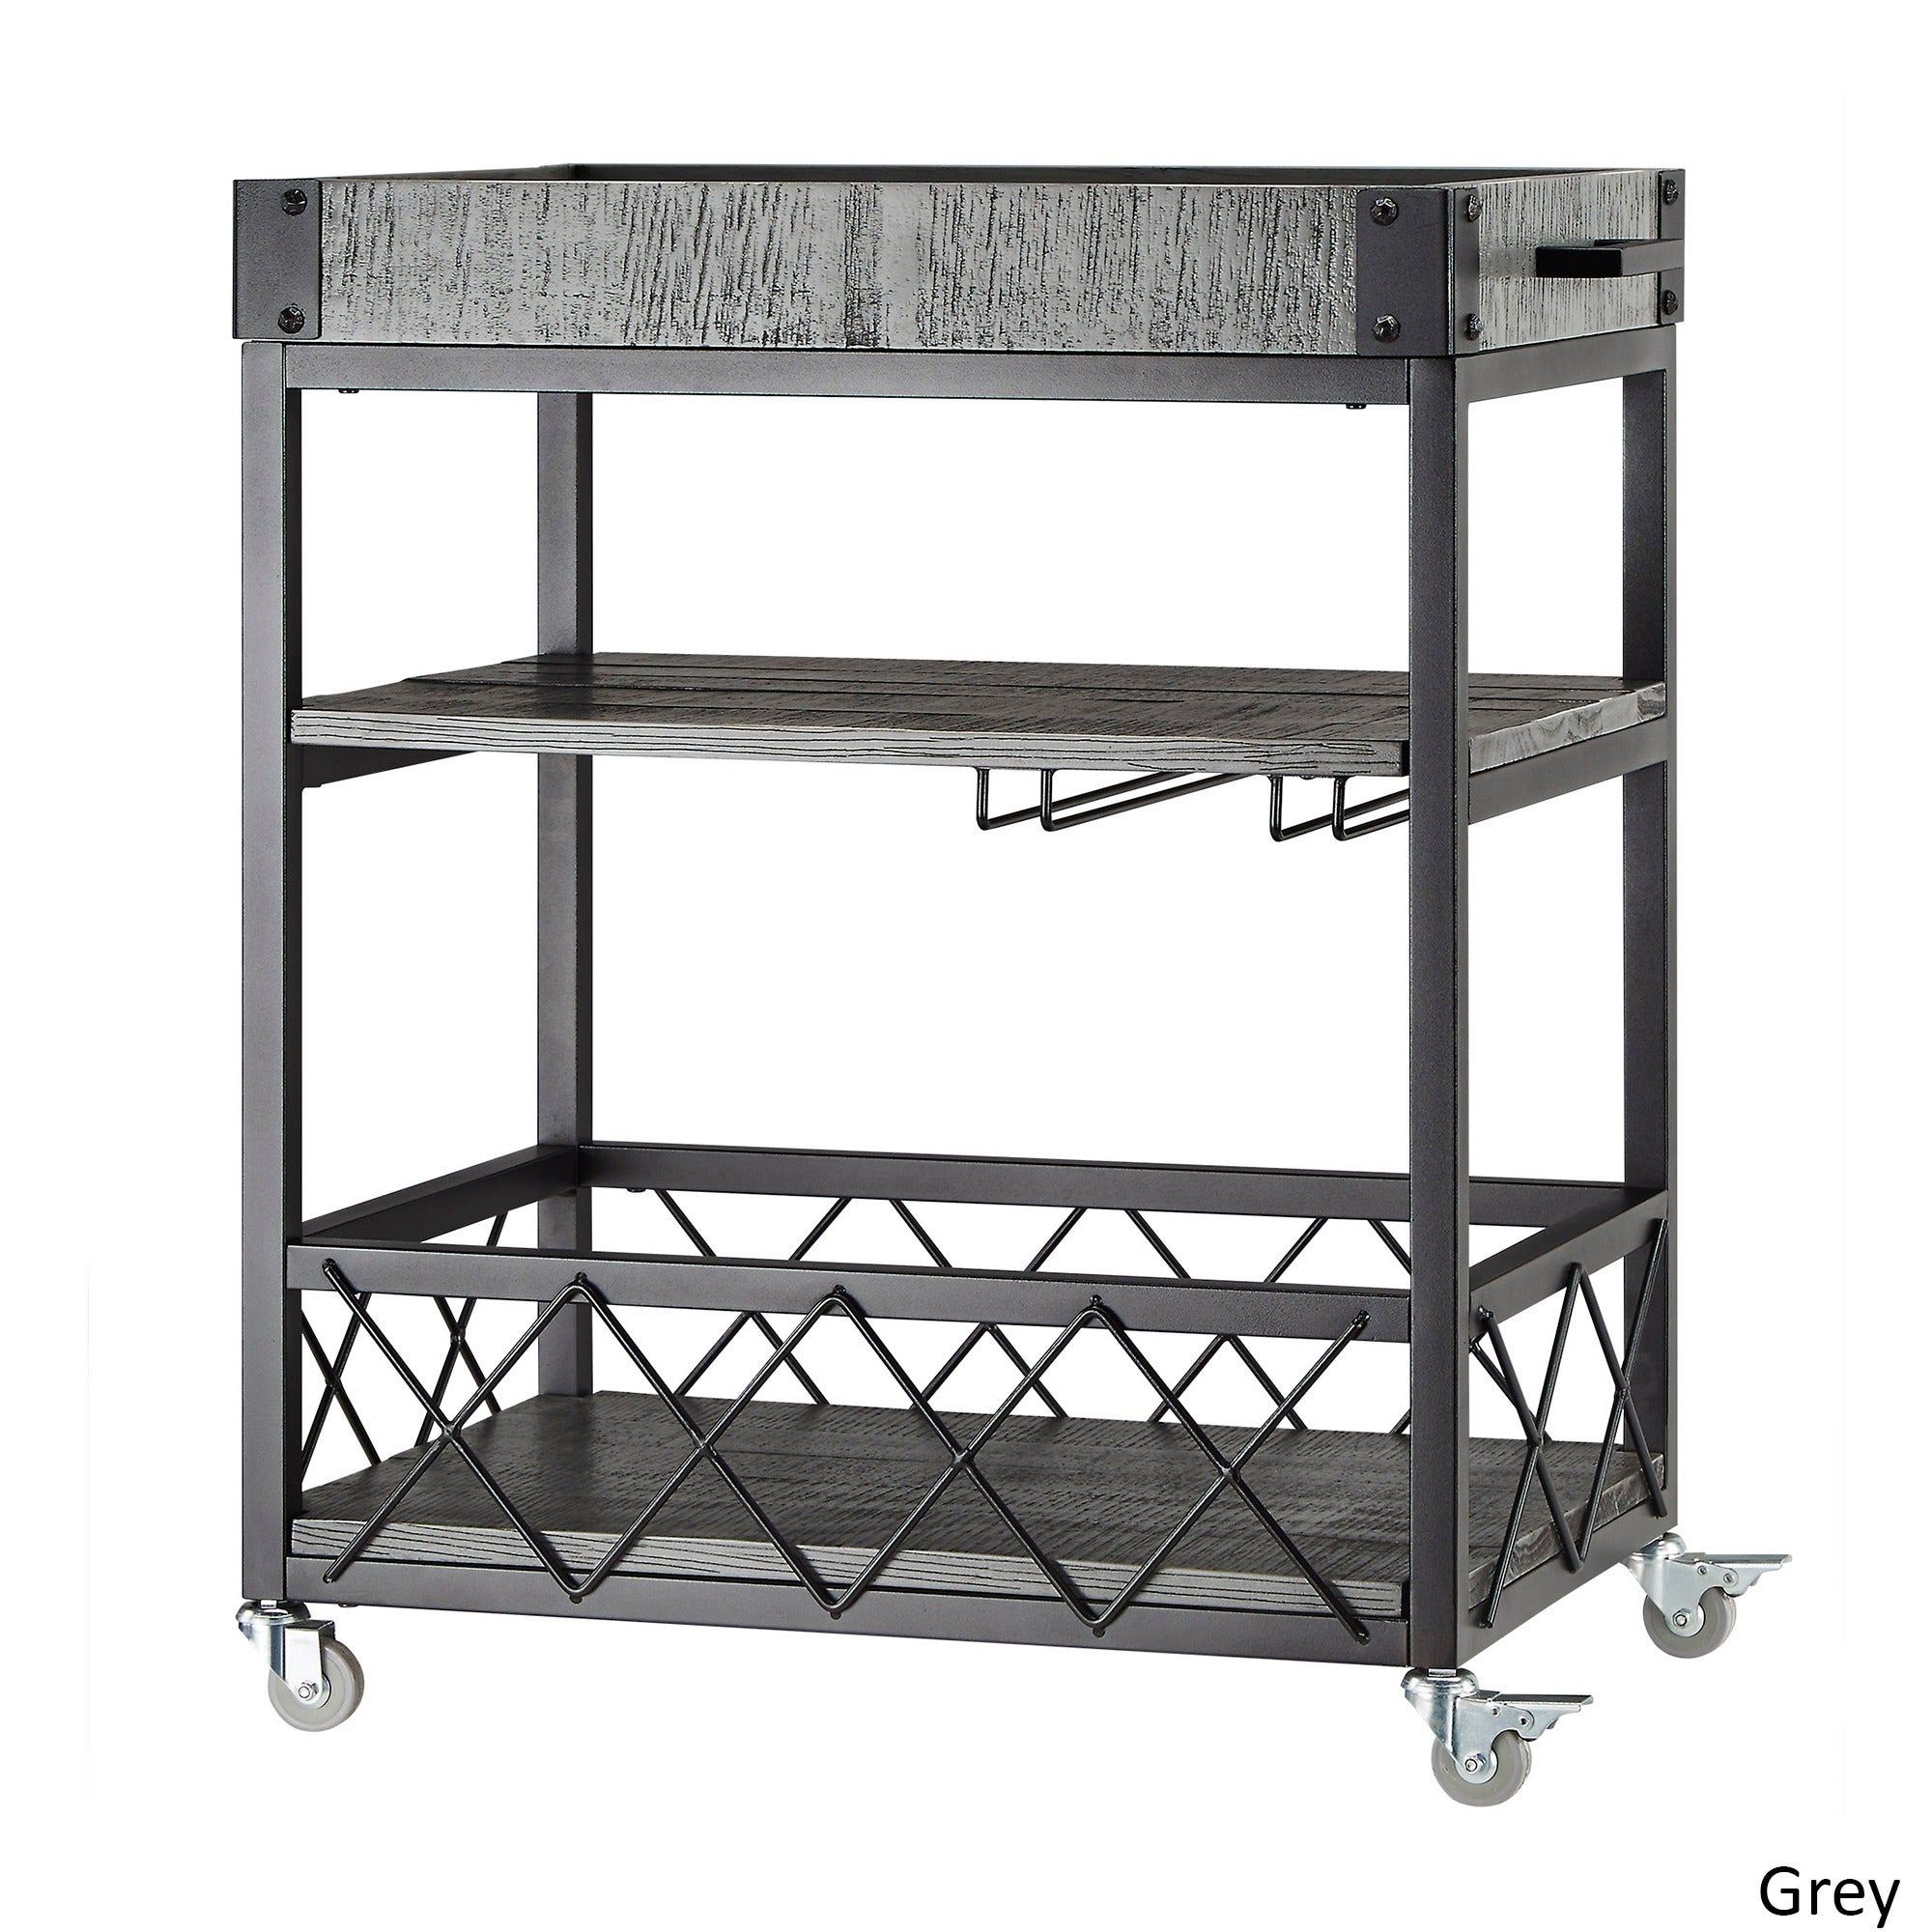 Wood And Metal Rolling Serving Cart Bar Serving Carts Myra Rustic Mobile Kitchen Bar Serving Cart Tutiflores Com Br